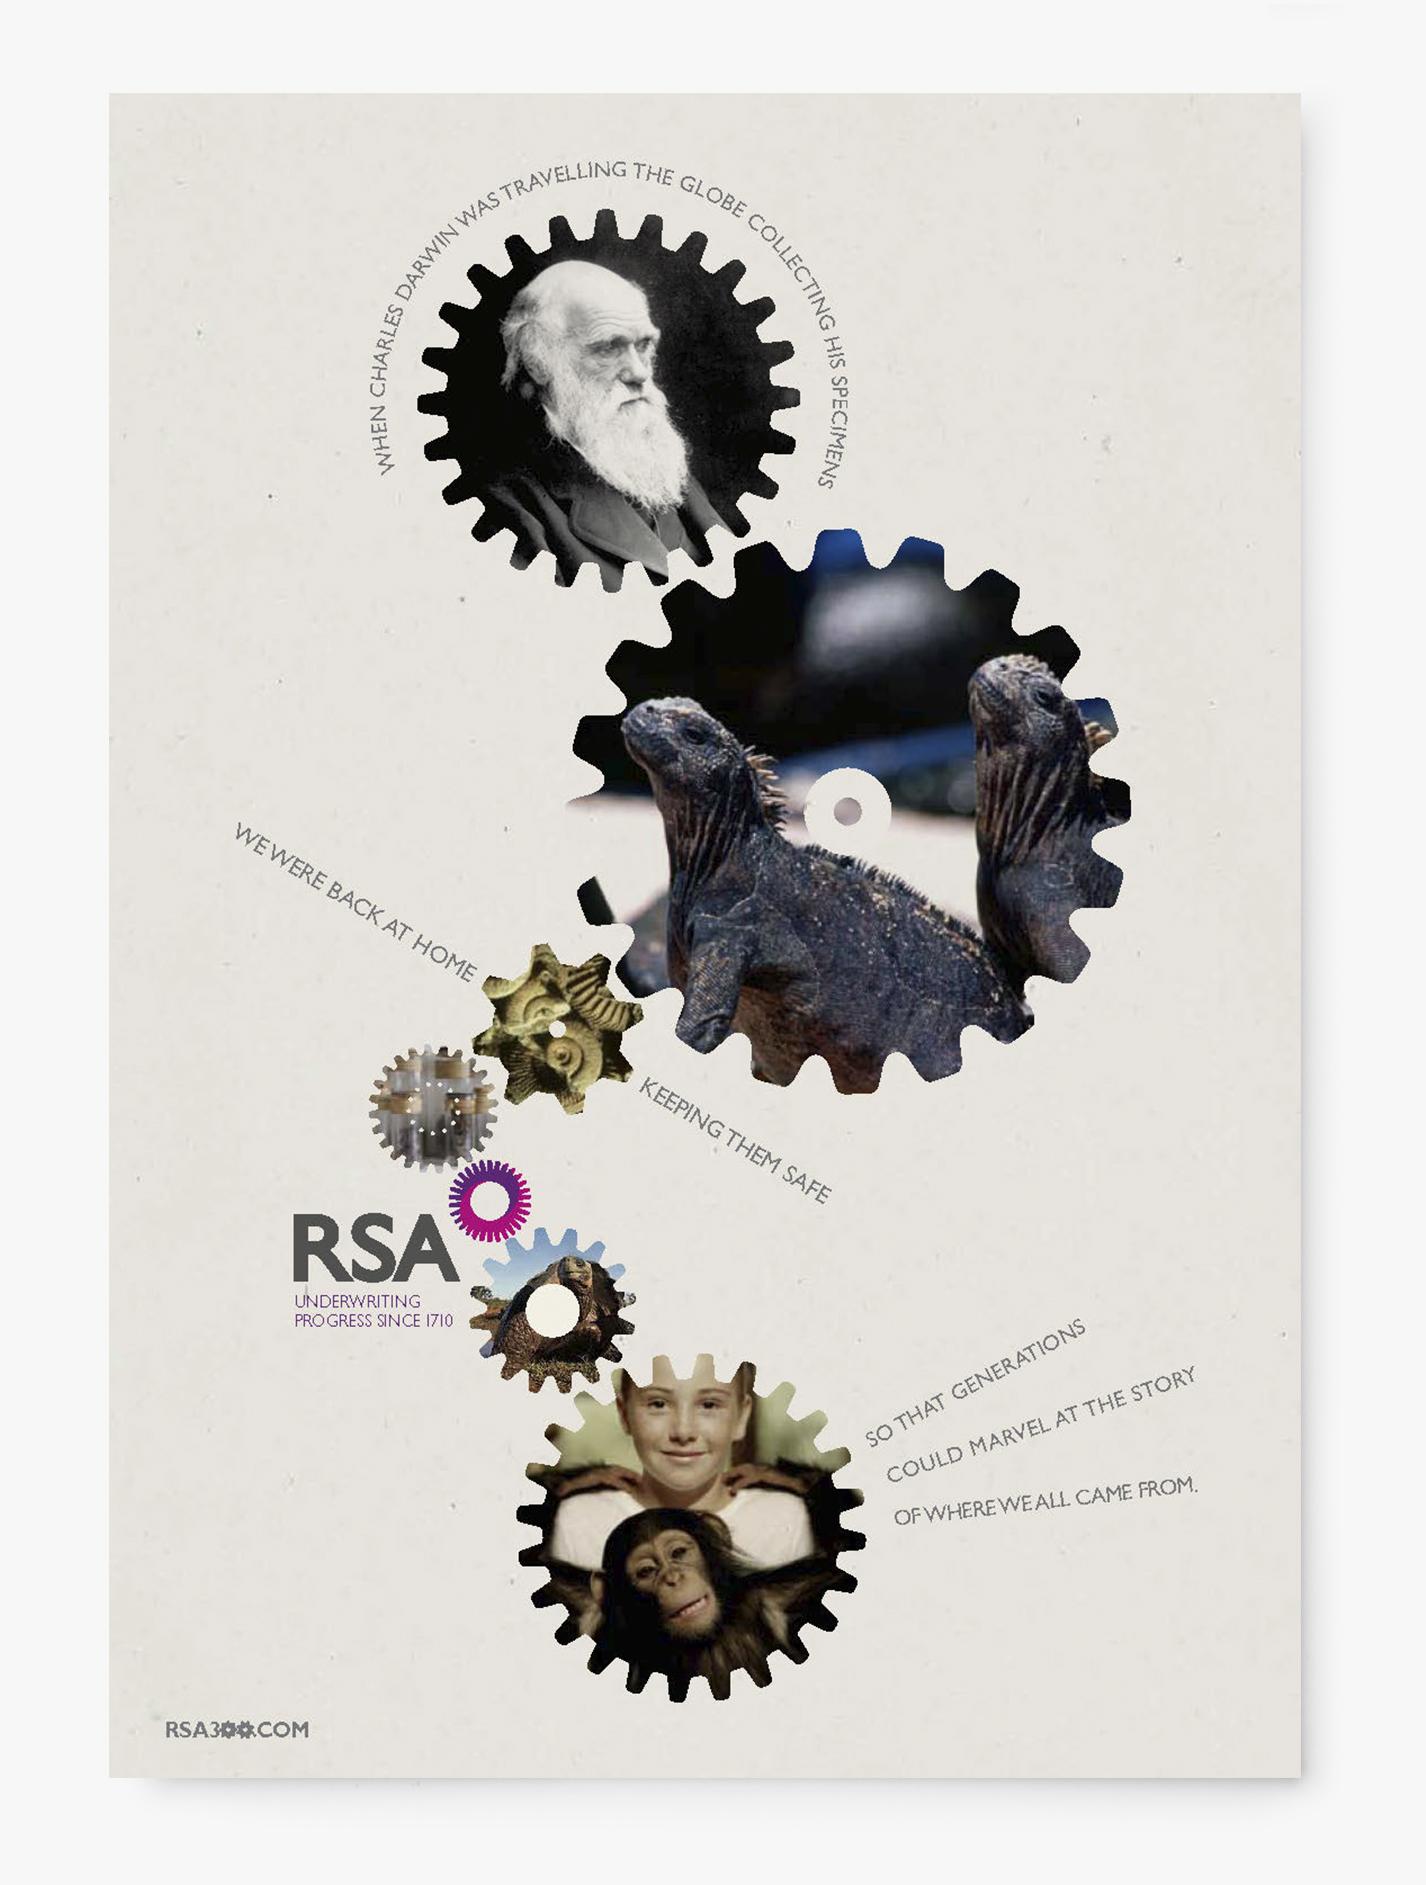 RSA_Cogs1.jpg